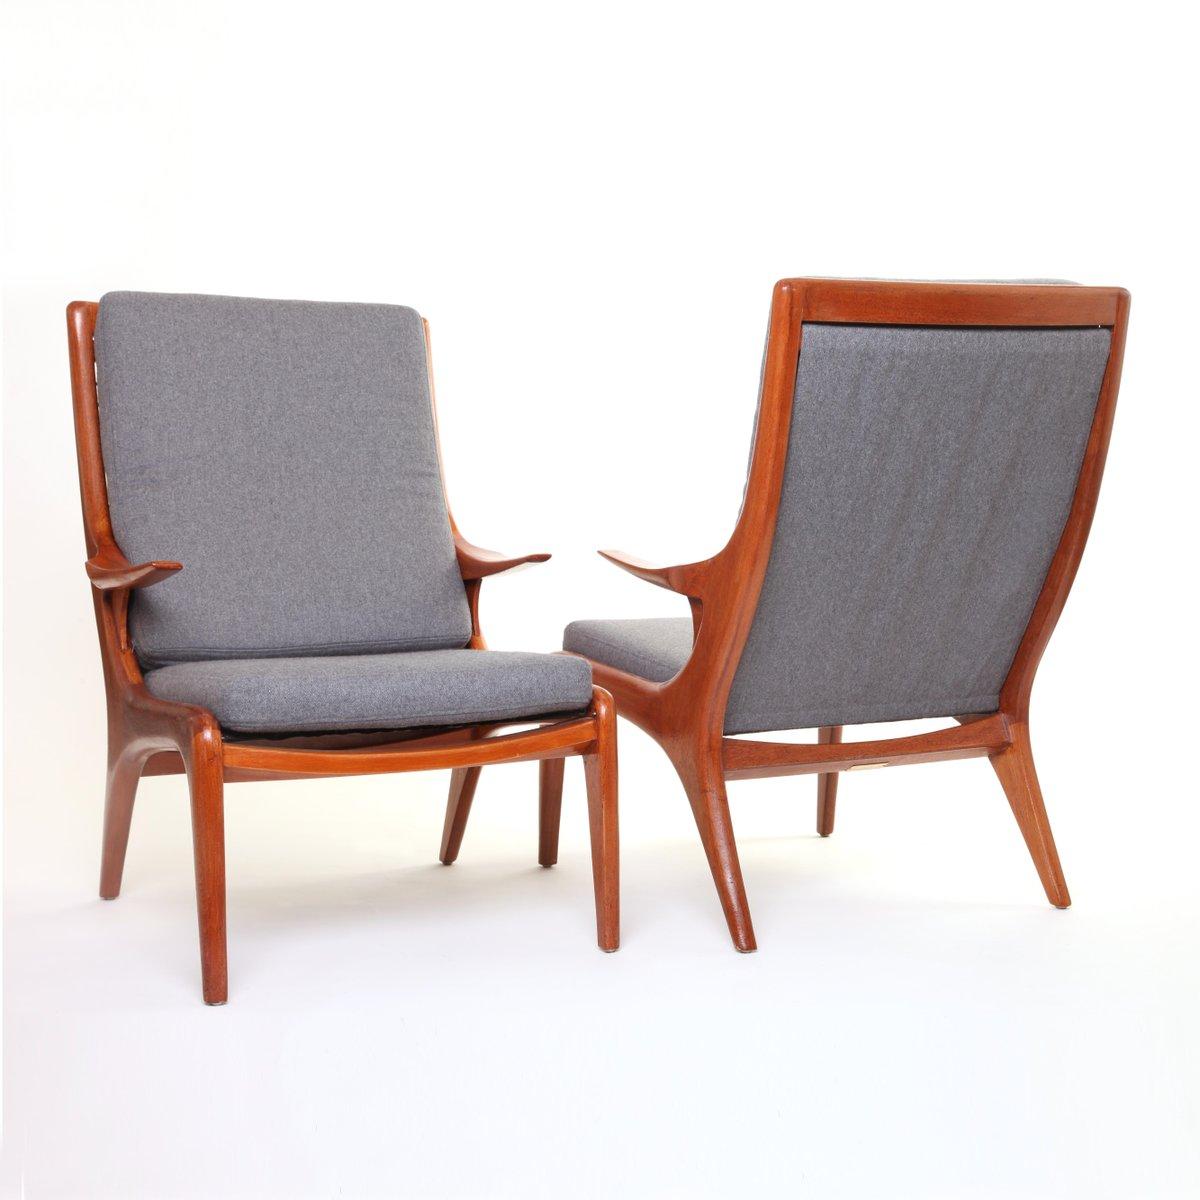 Armchairs By Vladimir Kagan, 1950s, Set Of 2